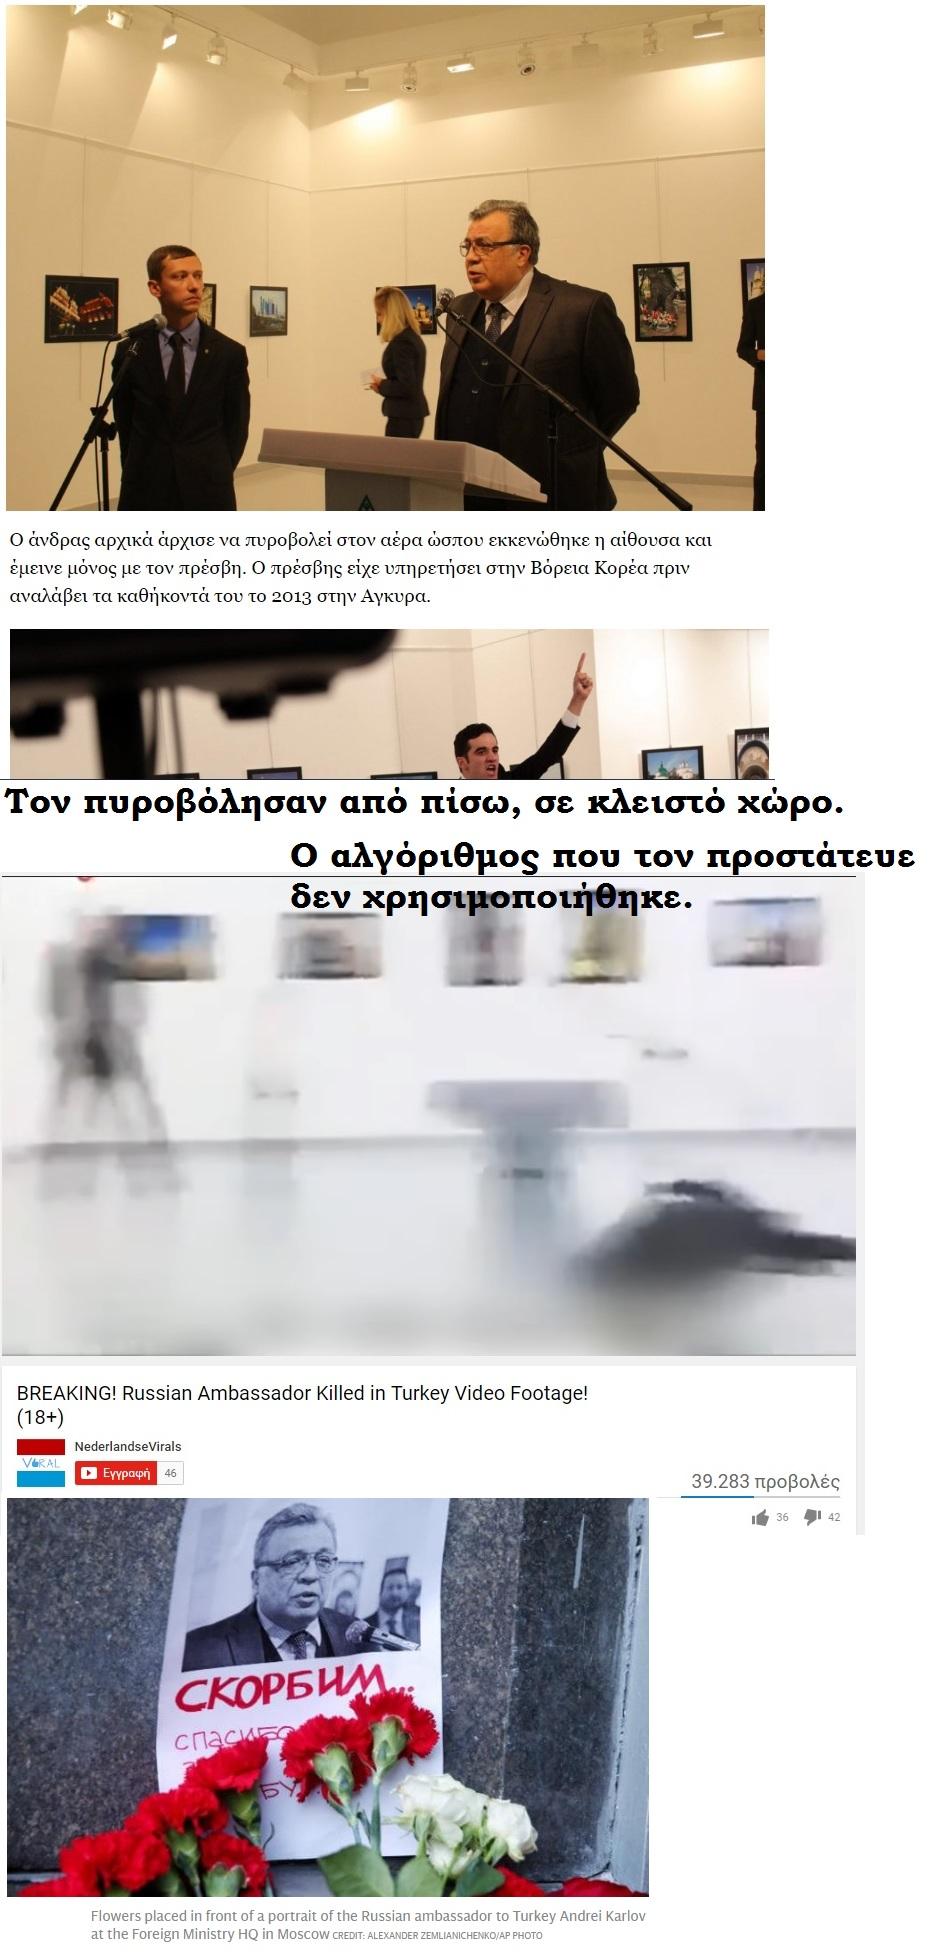 turkey-russia-ambassador-shot-death-ankara-aleppo-terror-06-201216